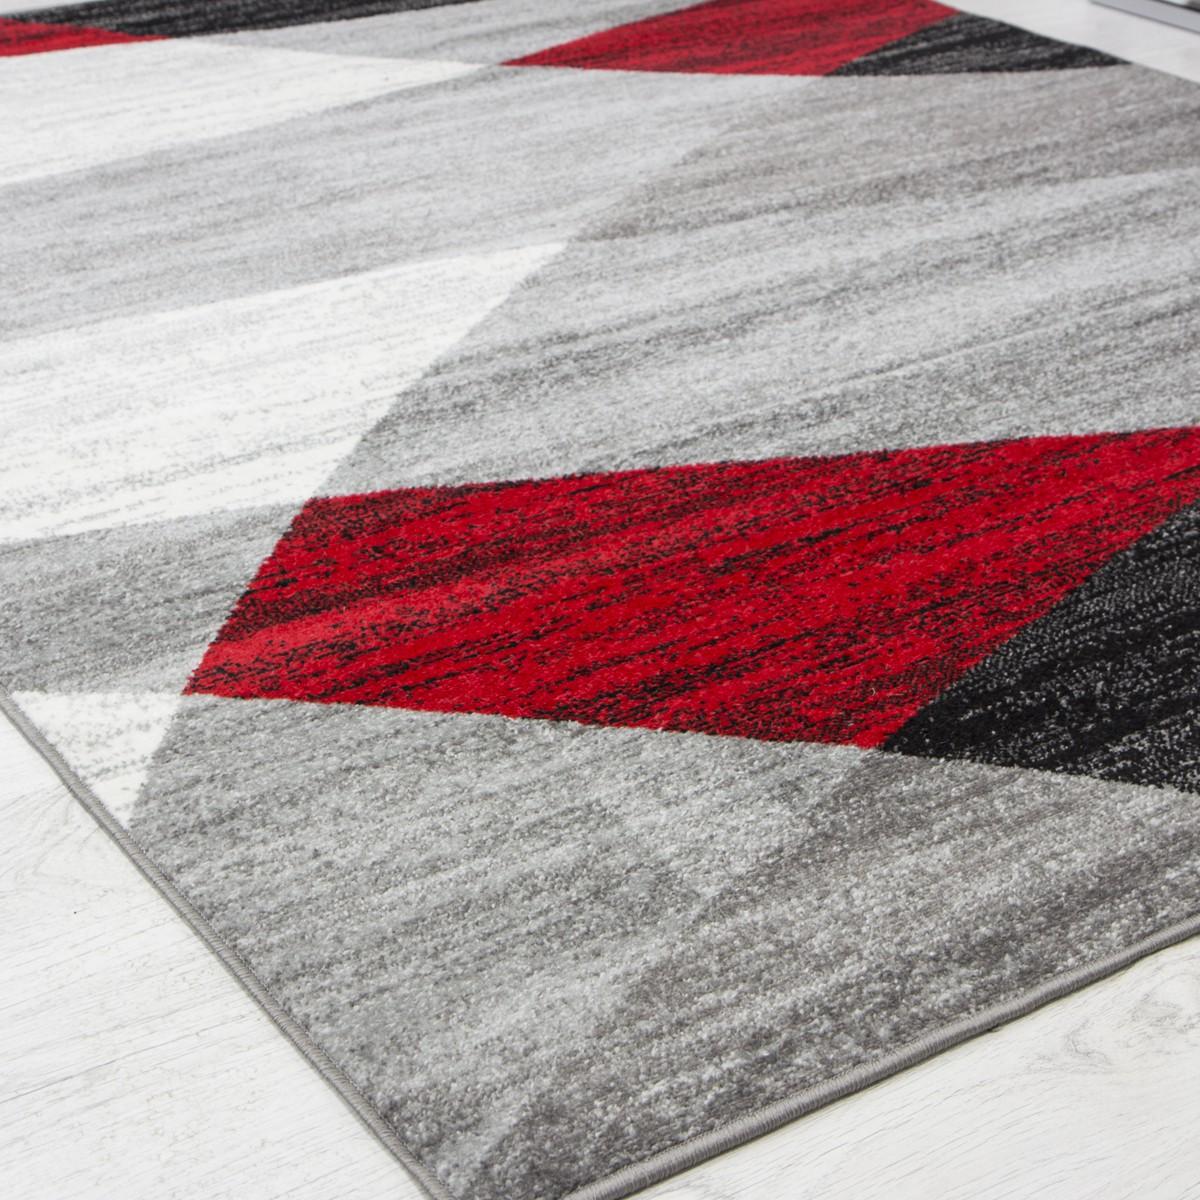 moderner designer teppich geometrisches muster meliert. Black Bedroom Furniture Sets. Home Design Ideas